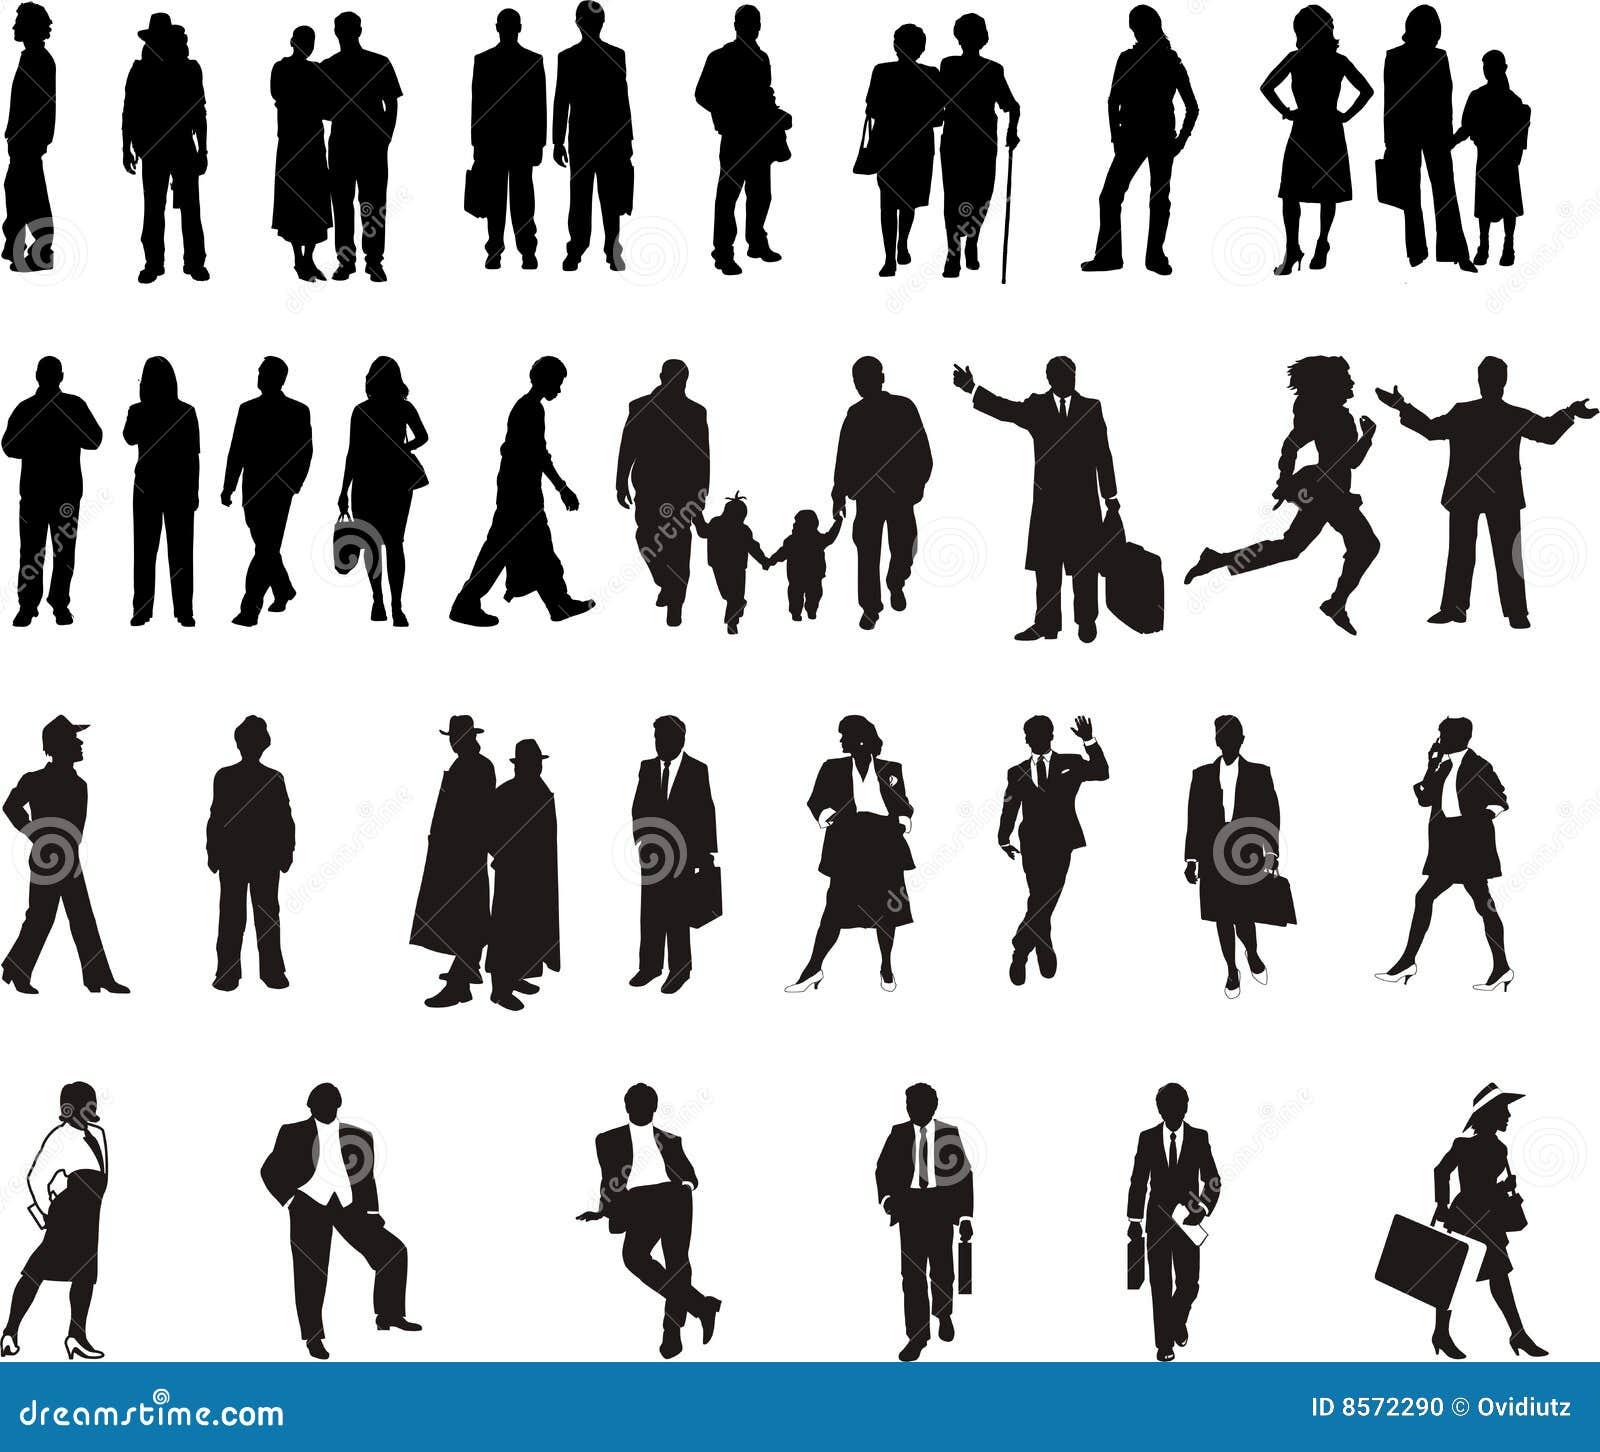 stockfoto silhouette black people bild 8572290